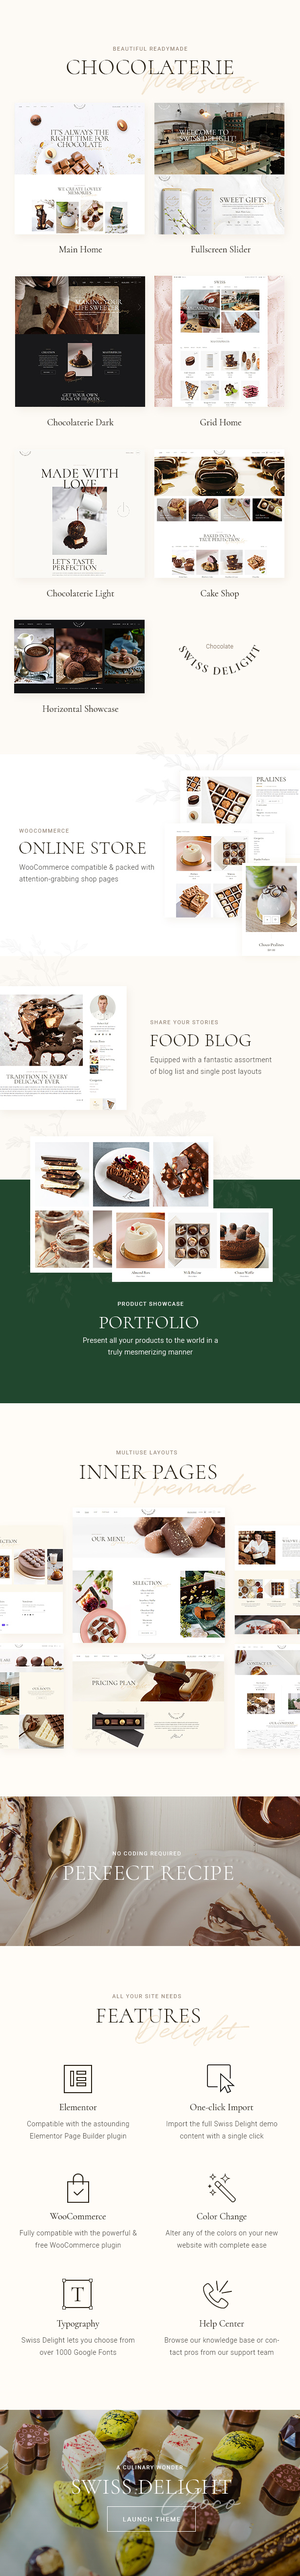 Swiss Delight - Chocolate & Cake Shop Theme - 2